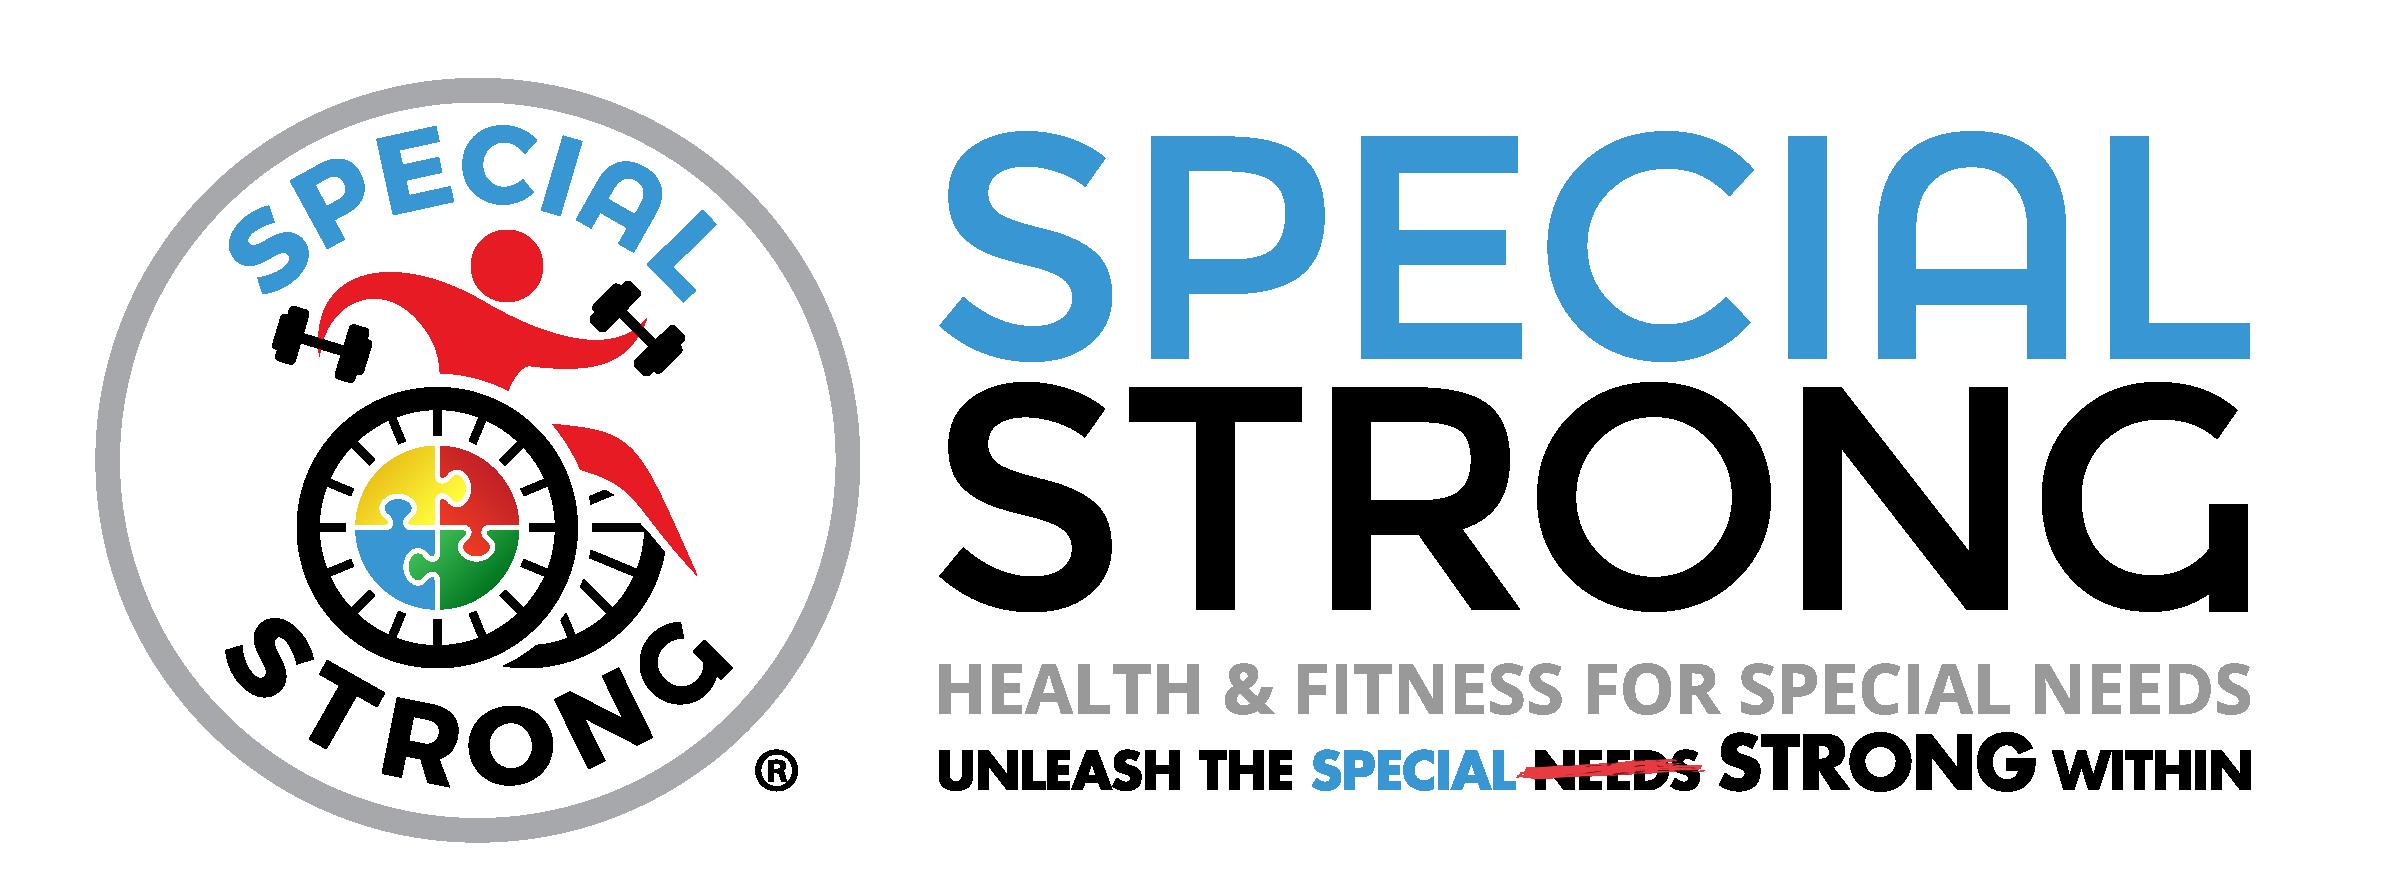 Special-Strong-logo